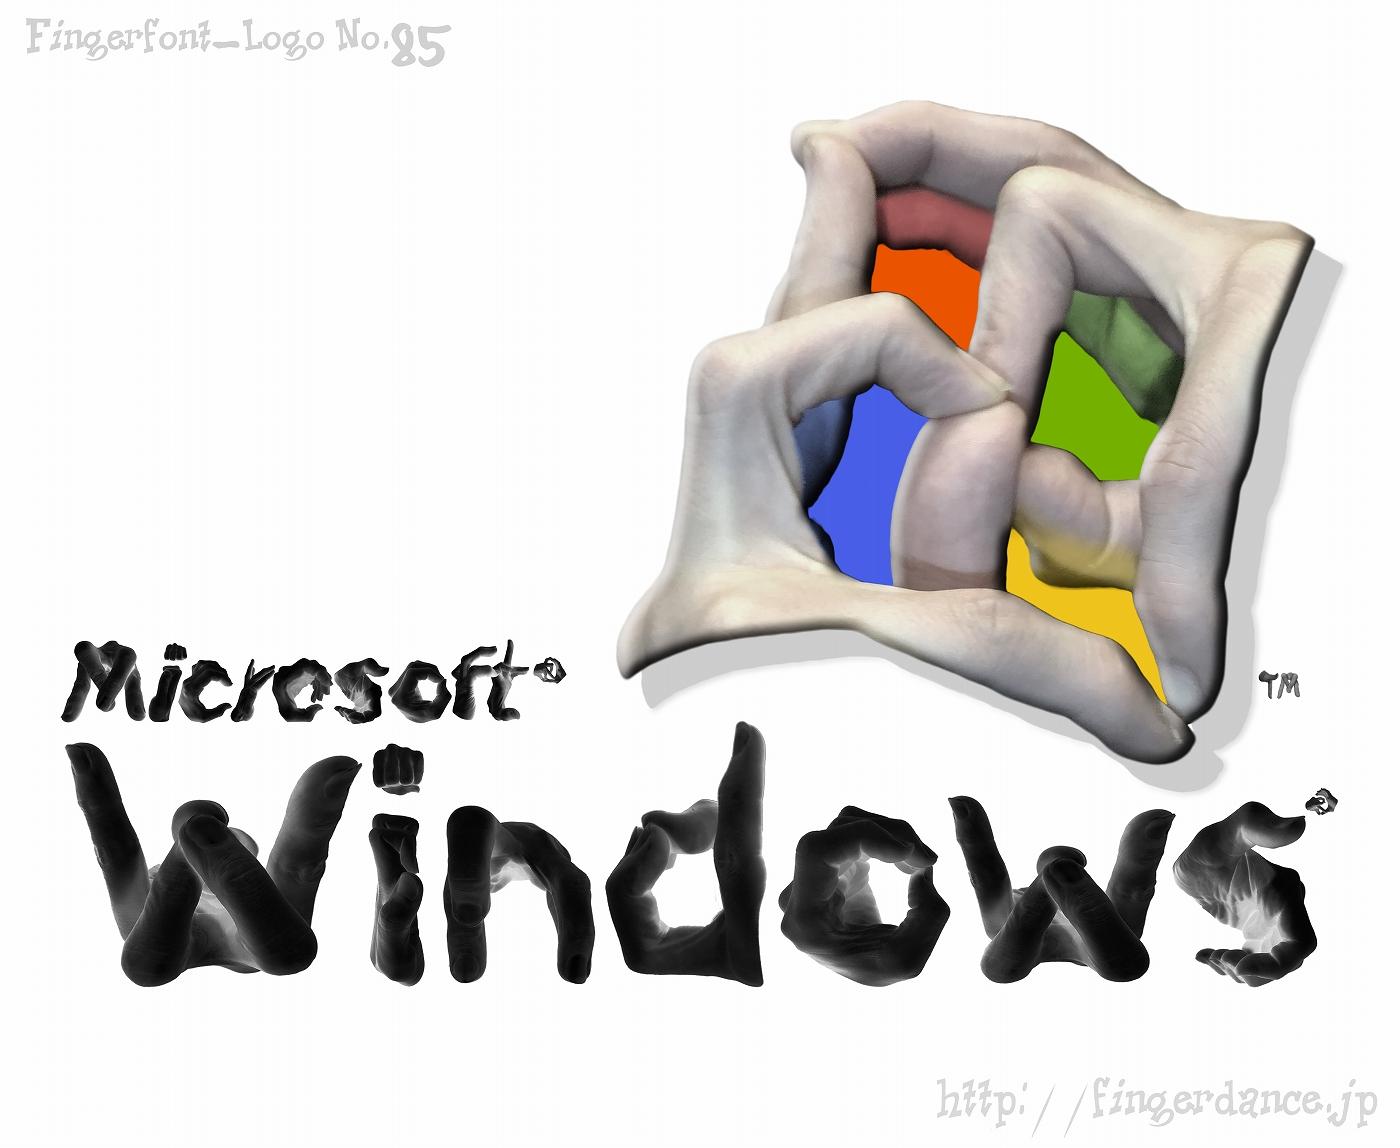 windows-fingerhttp://fingerdance.jp/L/logohand ウインドウズ・フィンガーロゴハンド手指